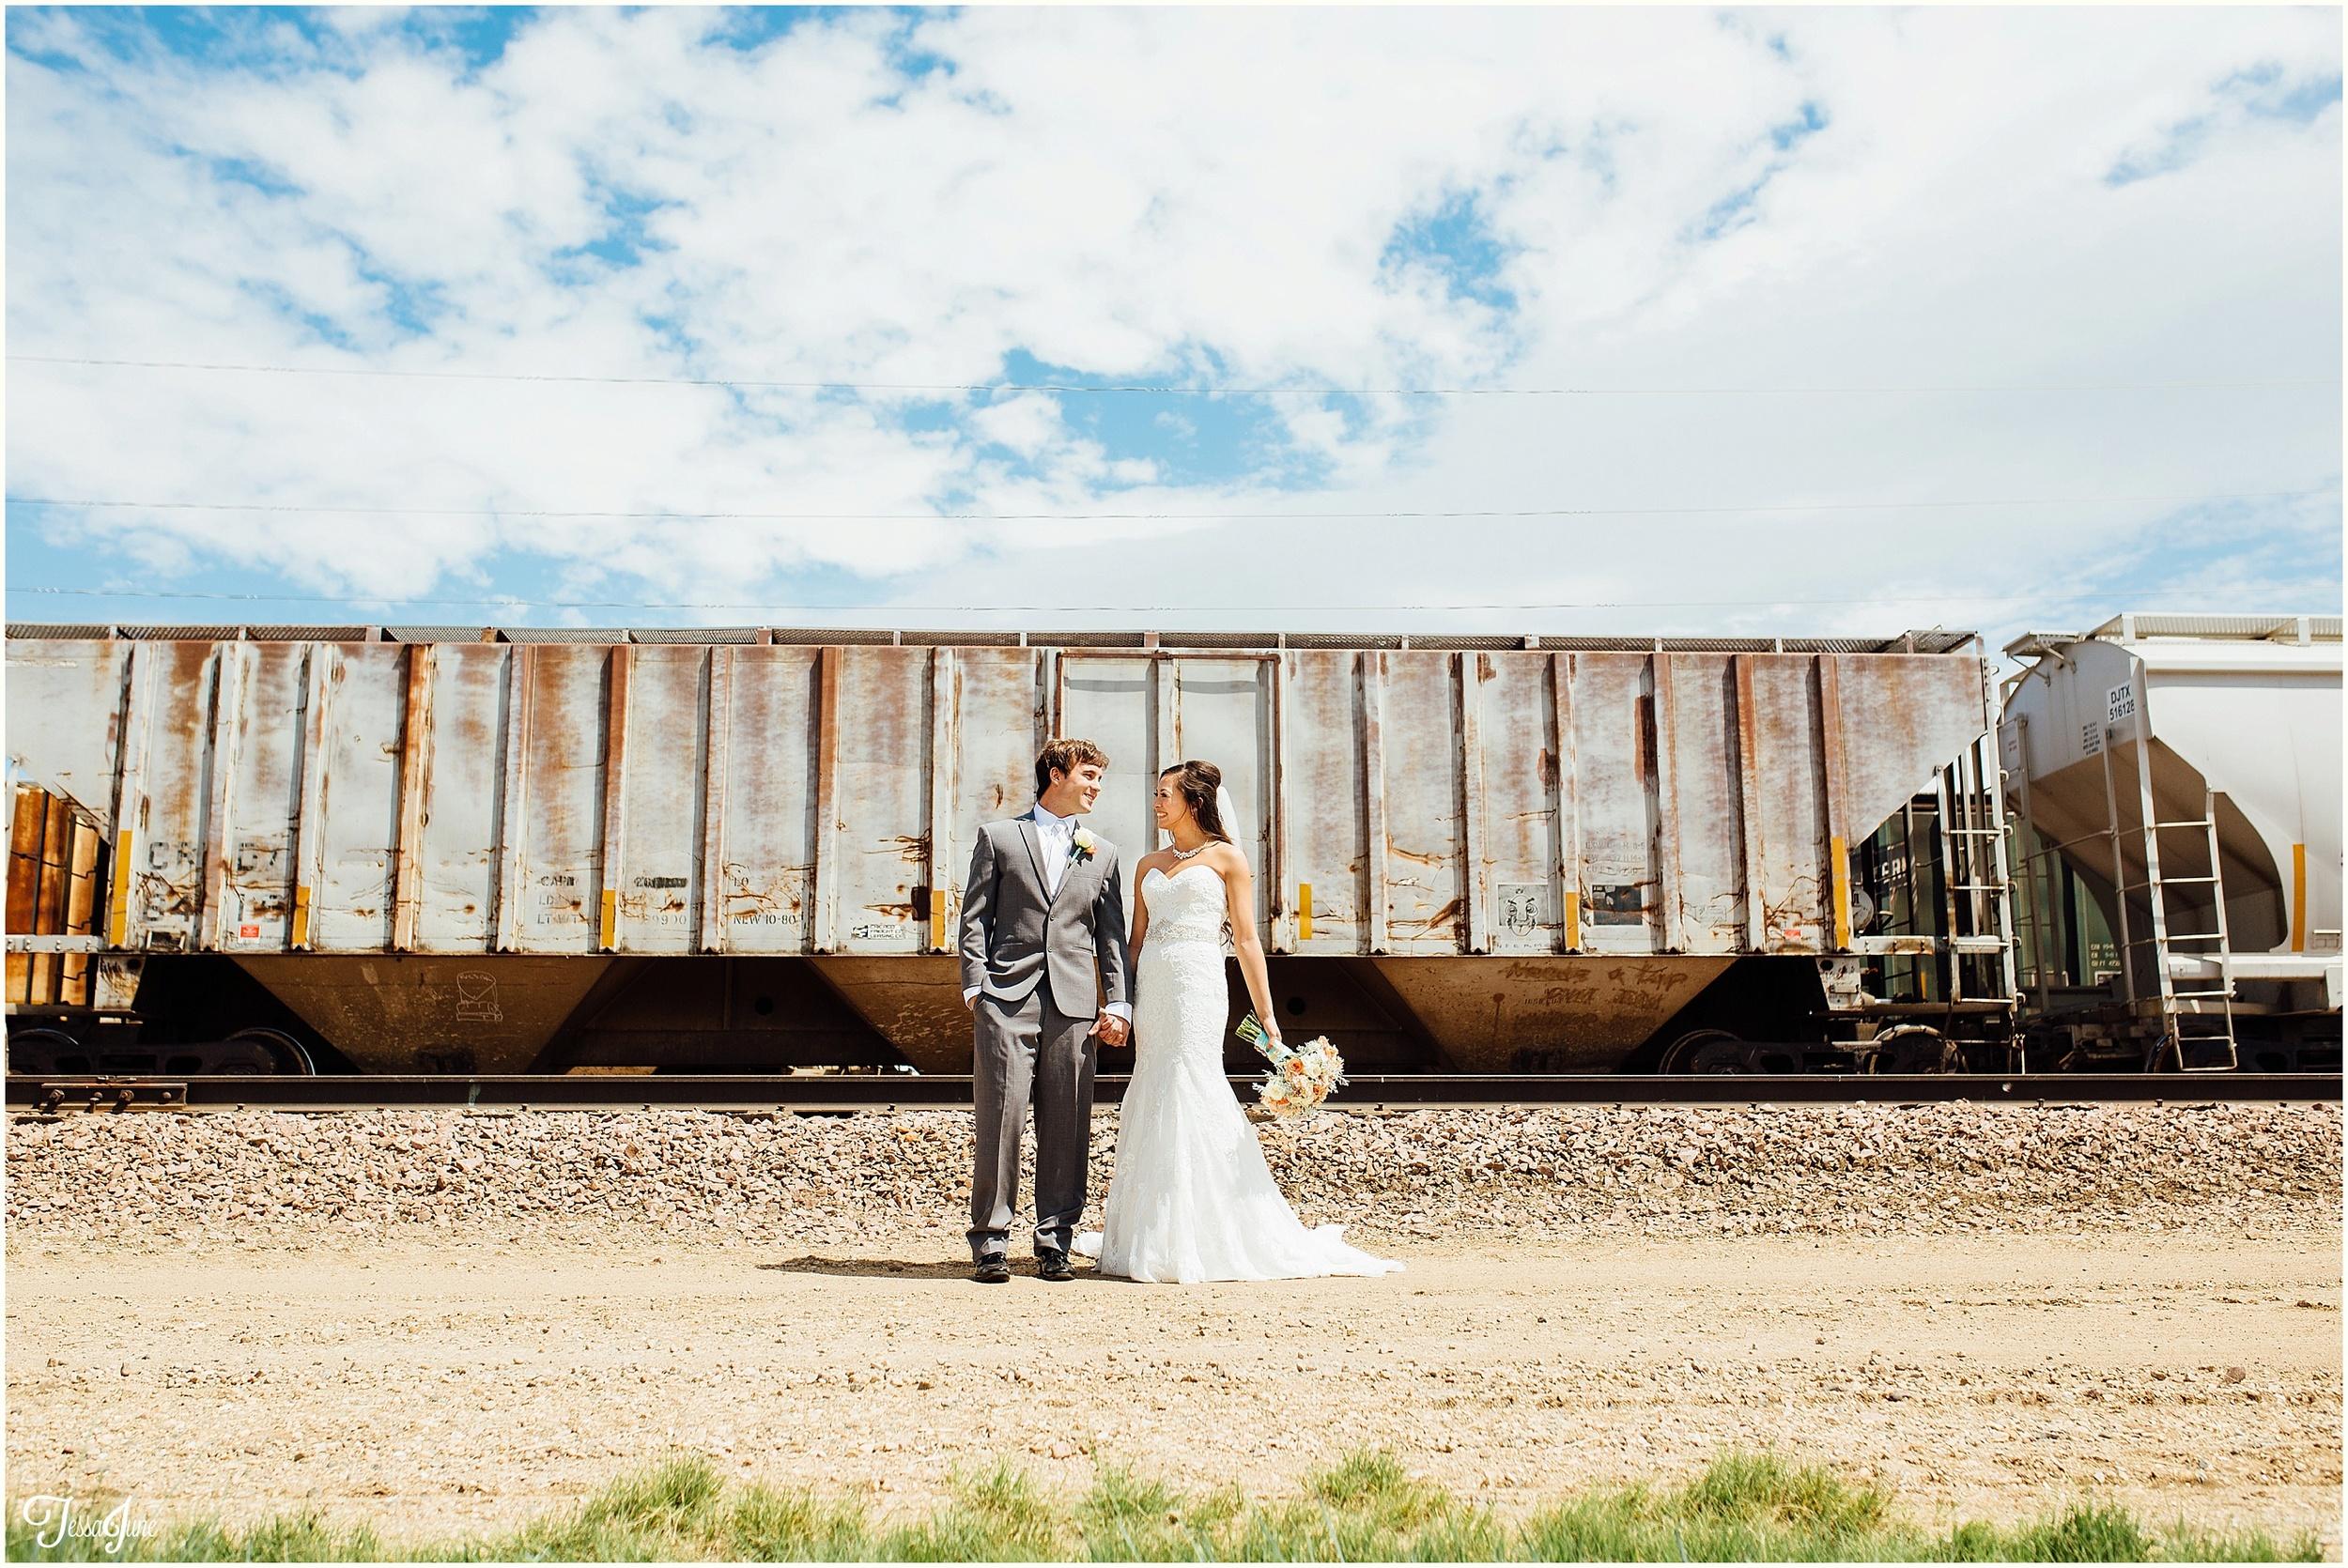 Decker-wedding-South-Dakota-Teal-Blue-train